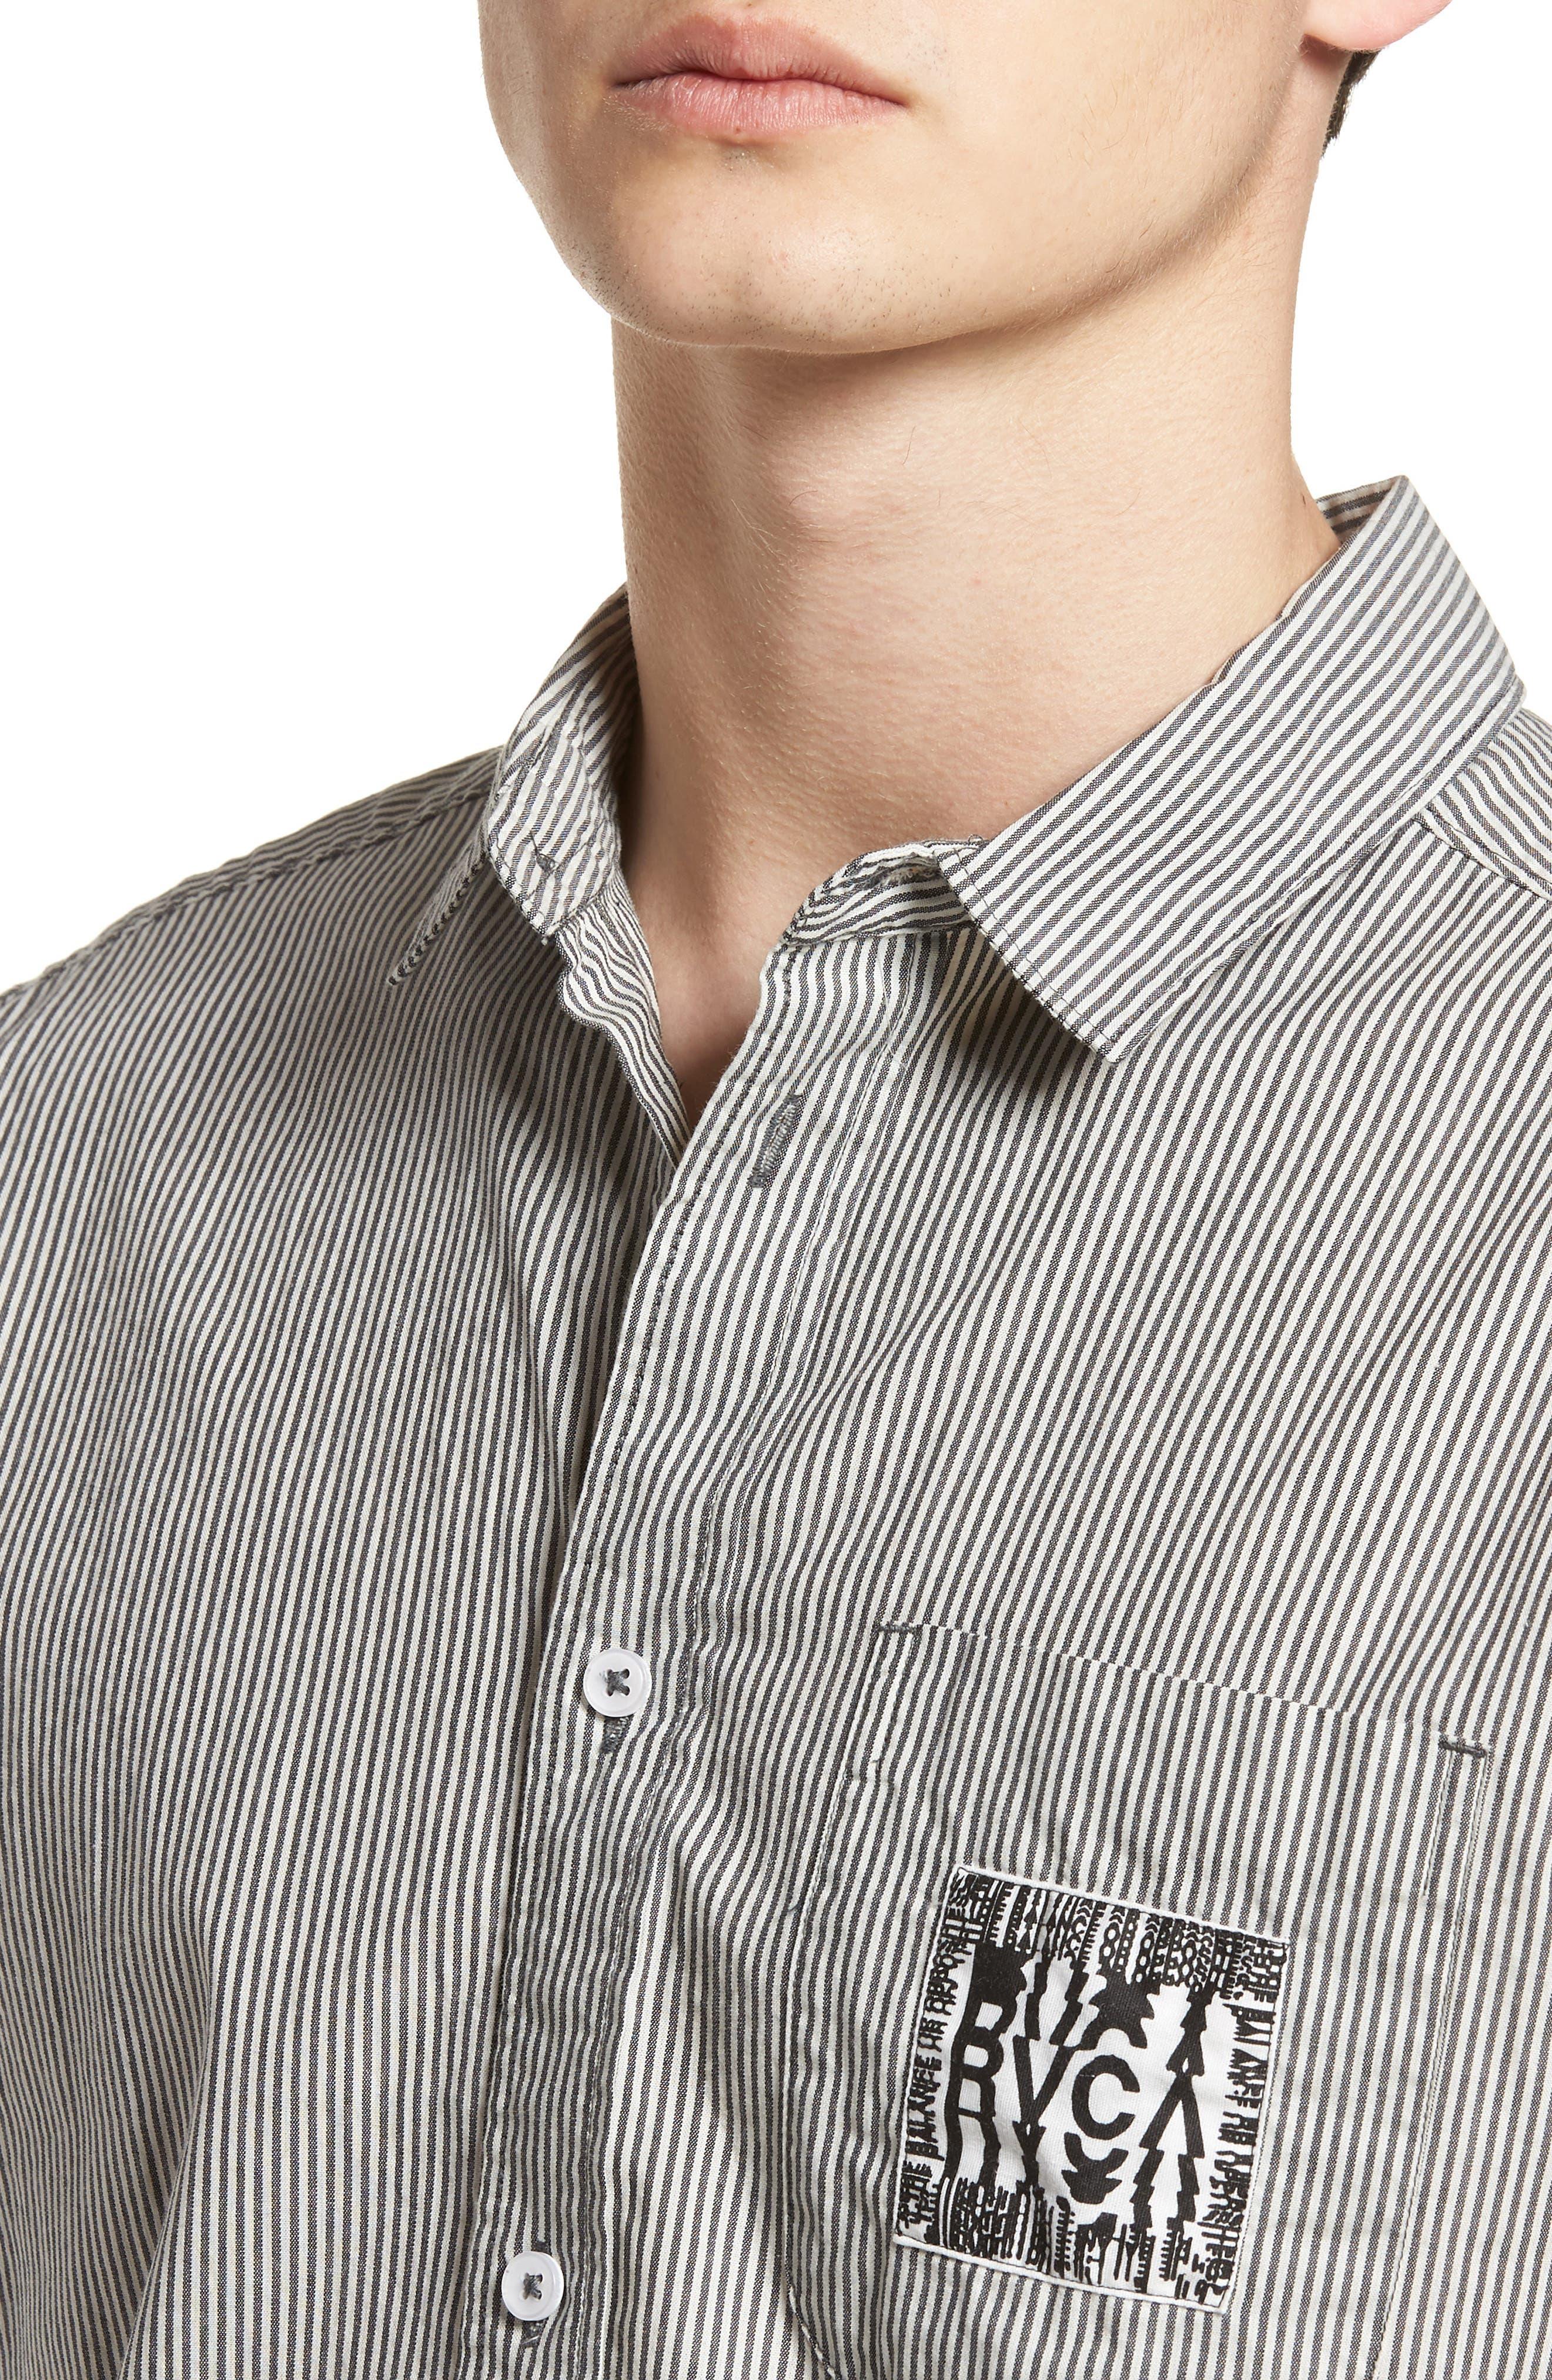 resort Disruption Woven Shirt,                             Alternate thumbnail 4, color,                             001